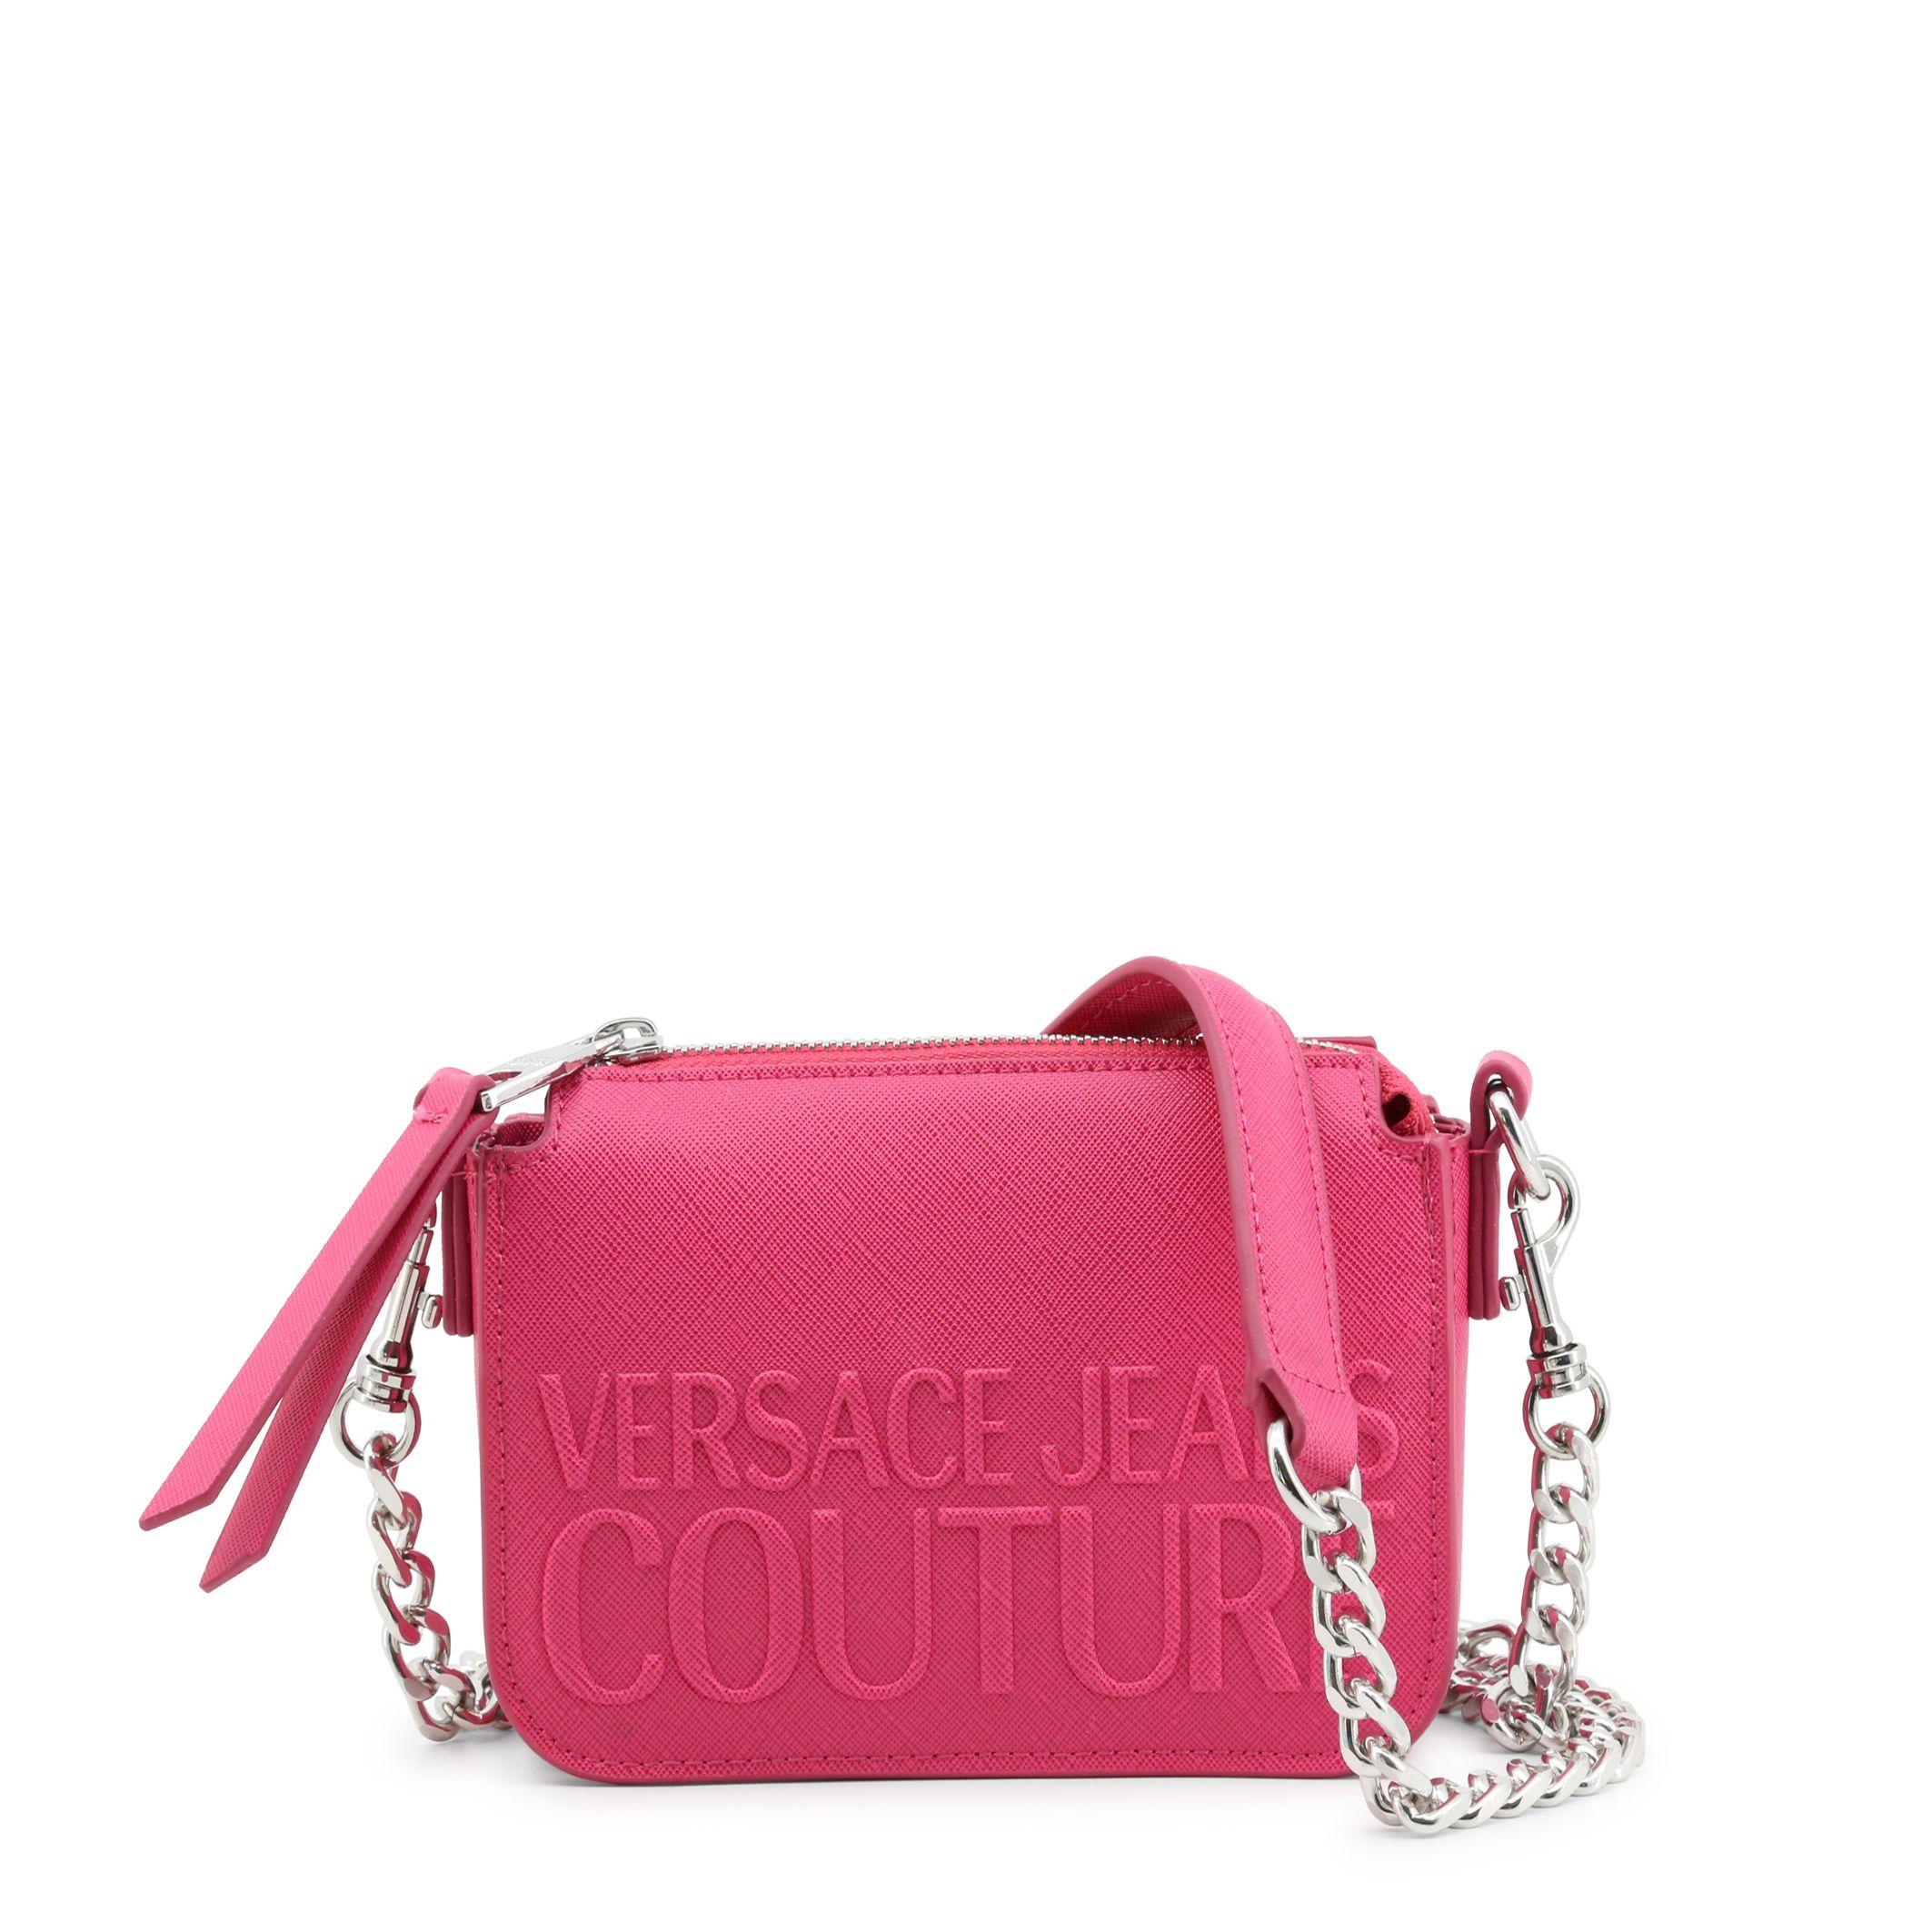 Versace Jeans – E1VWABR4_71882 – Rosa